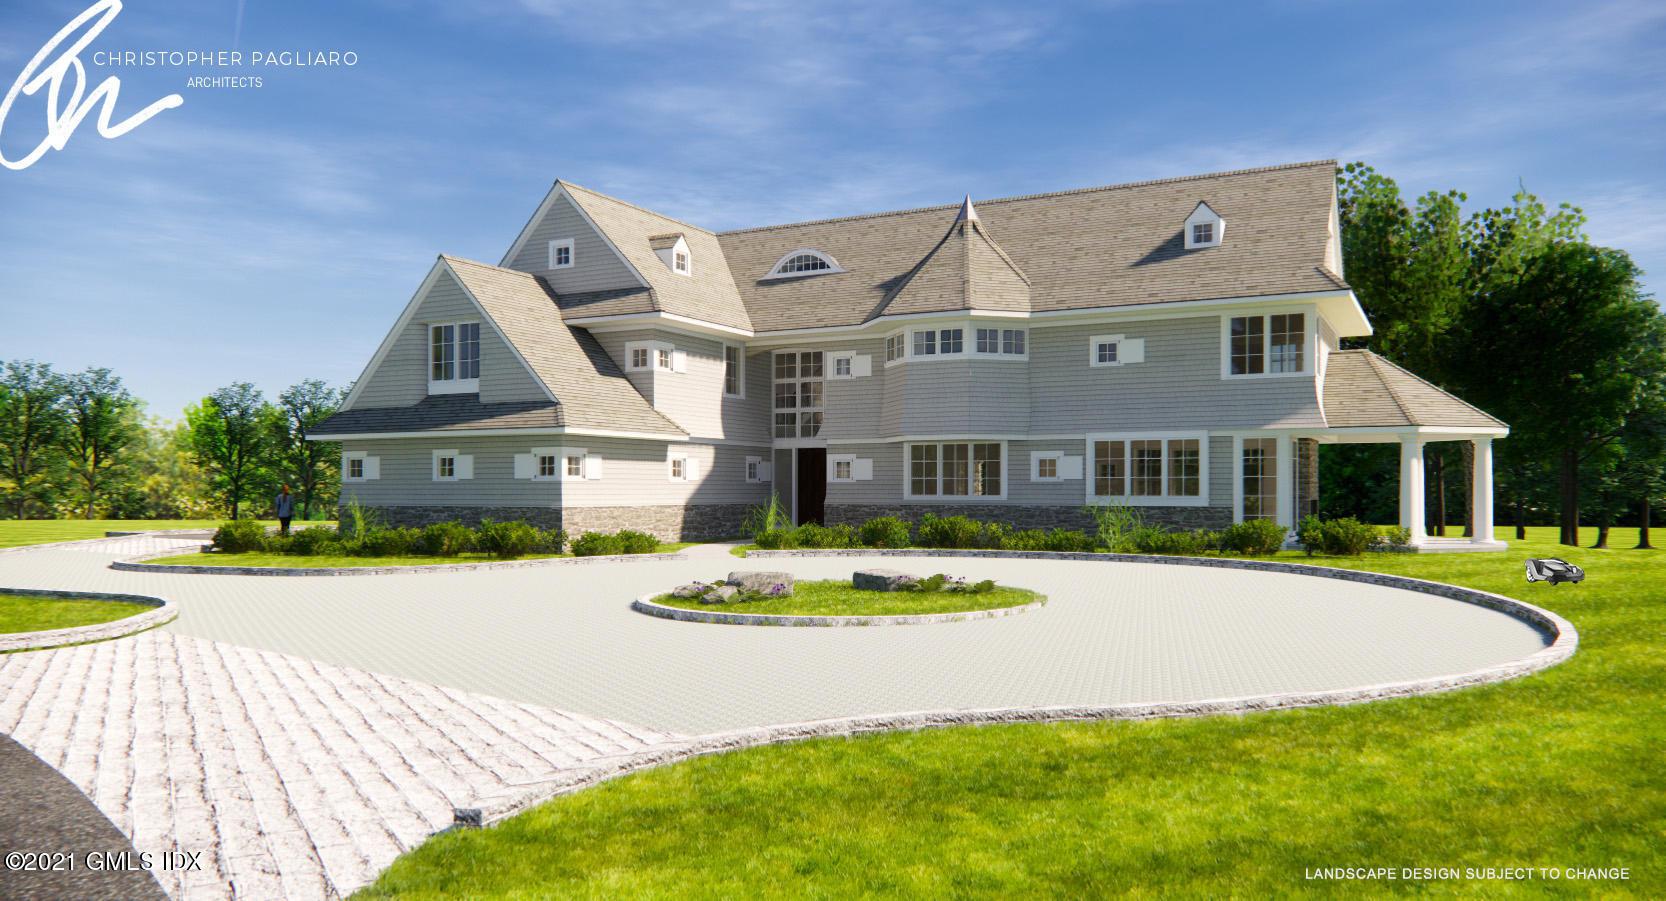 5 Stillman Lane, Greenwich, Connecticut 06831, 6 Bedrooms Bedrooms, ,6 BathroomsBathrooms,Single family,For sale,Stillman,112018